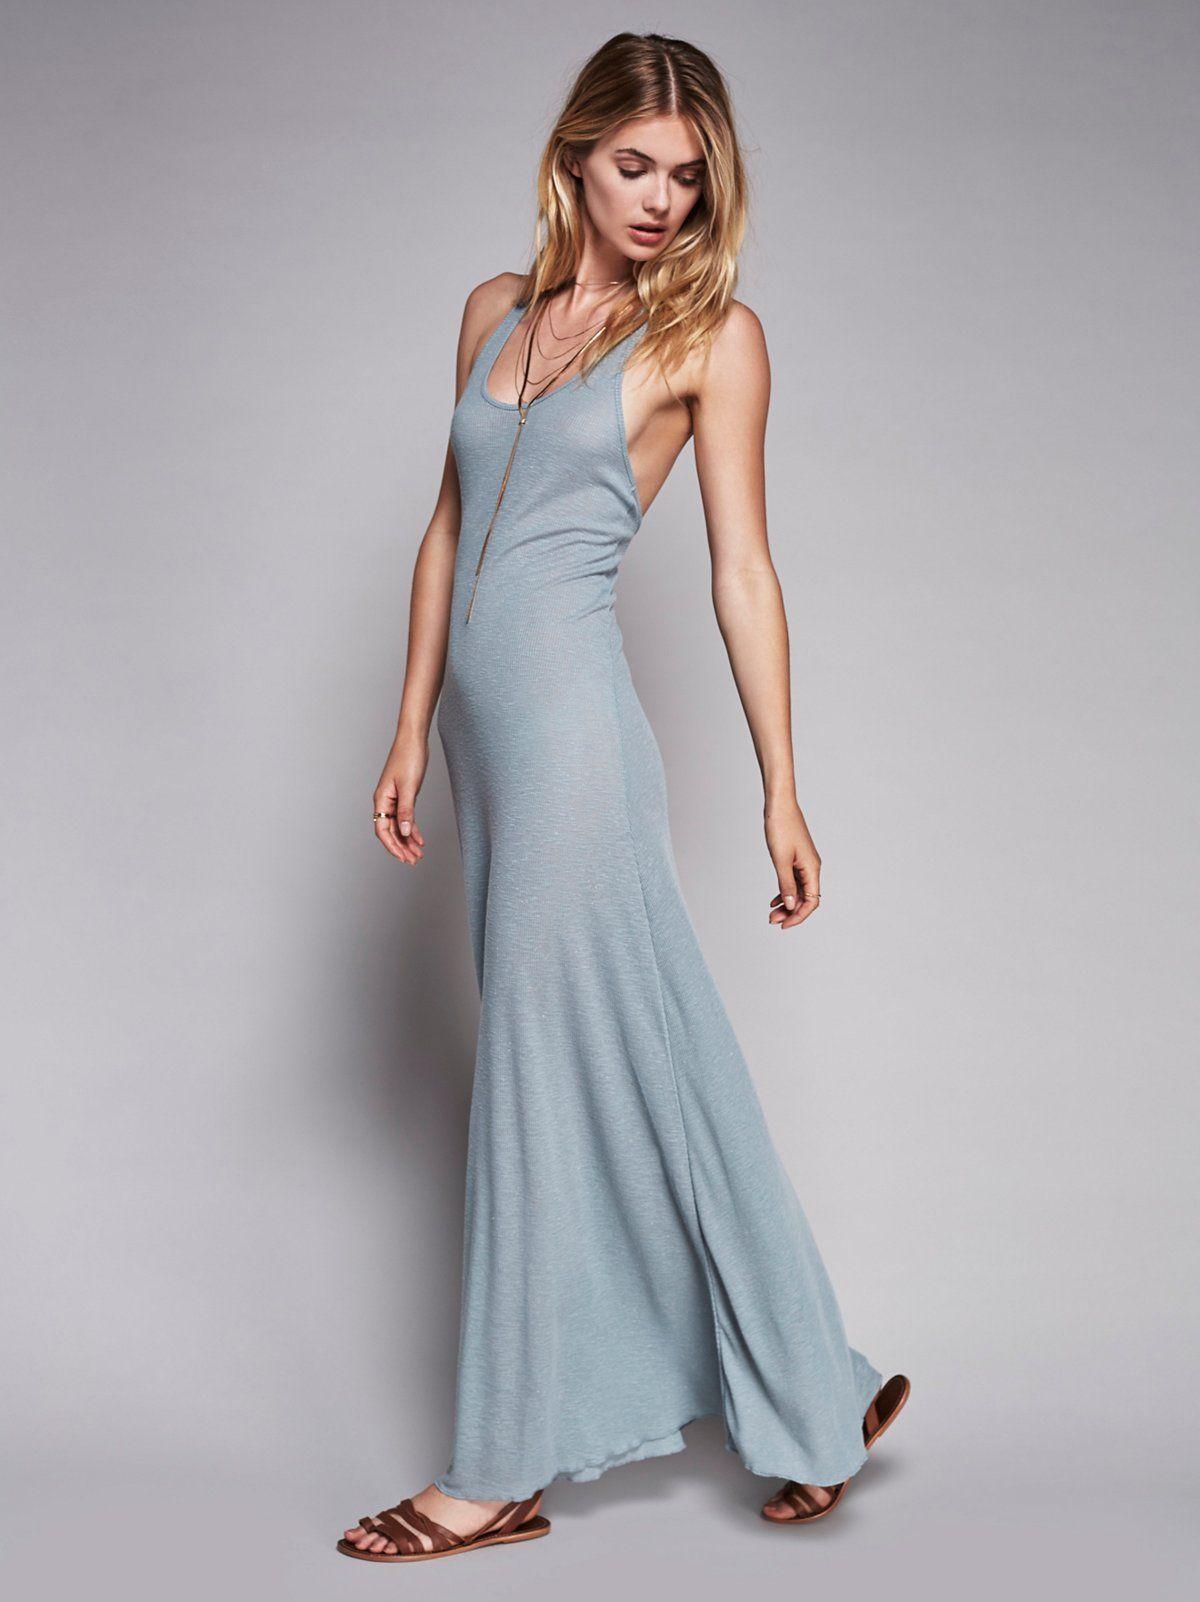 Girlfriend maxi white maxi dress boho dresses sheer